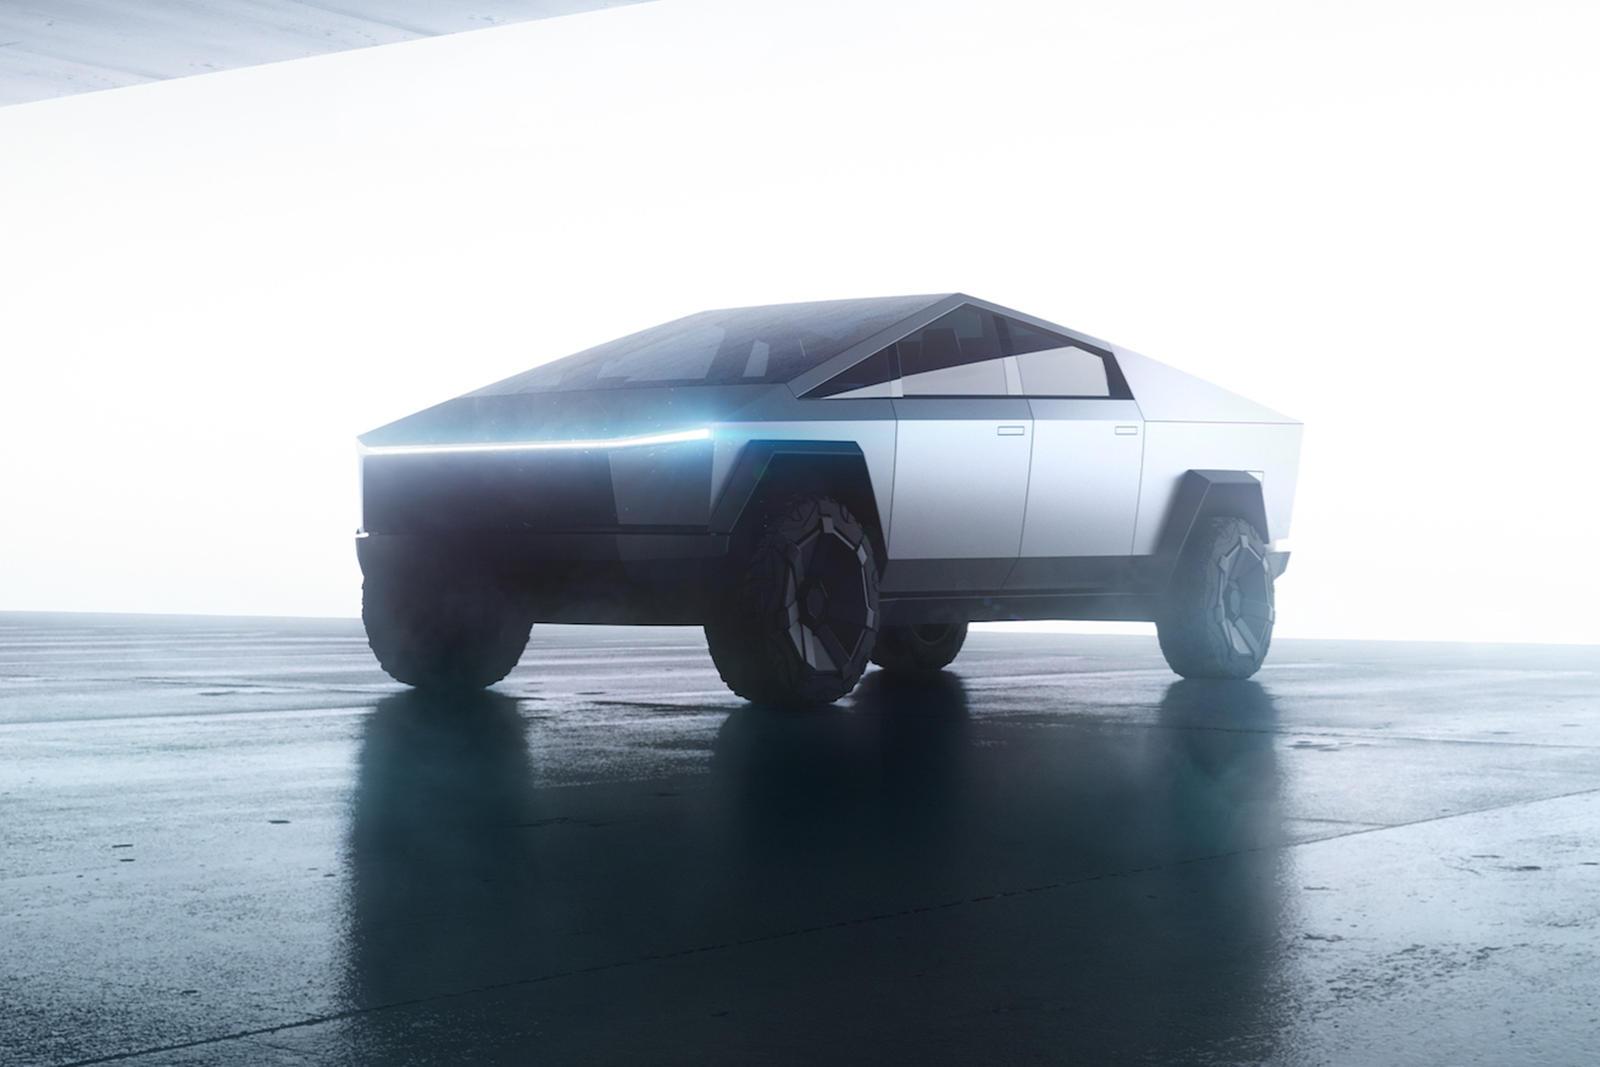 Tesla Cybertruck Tech Could Change The Truck Industry ...